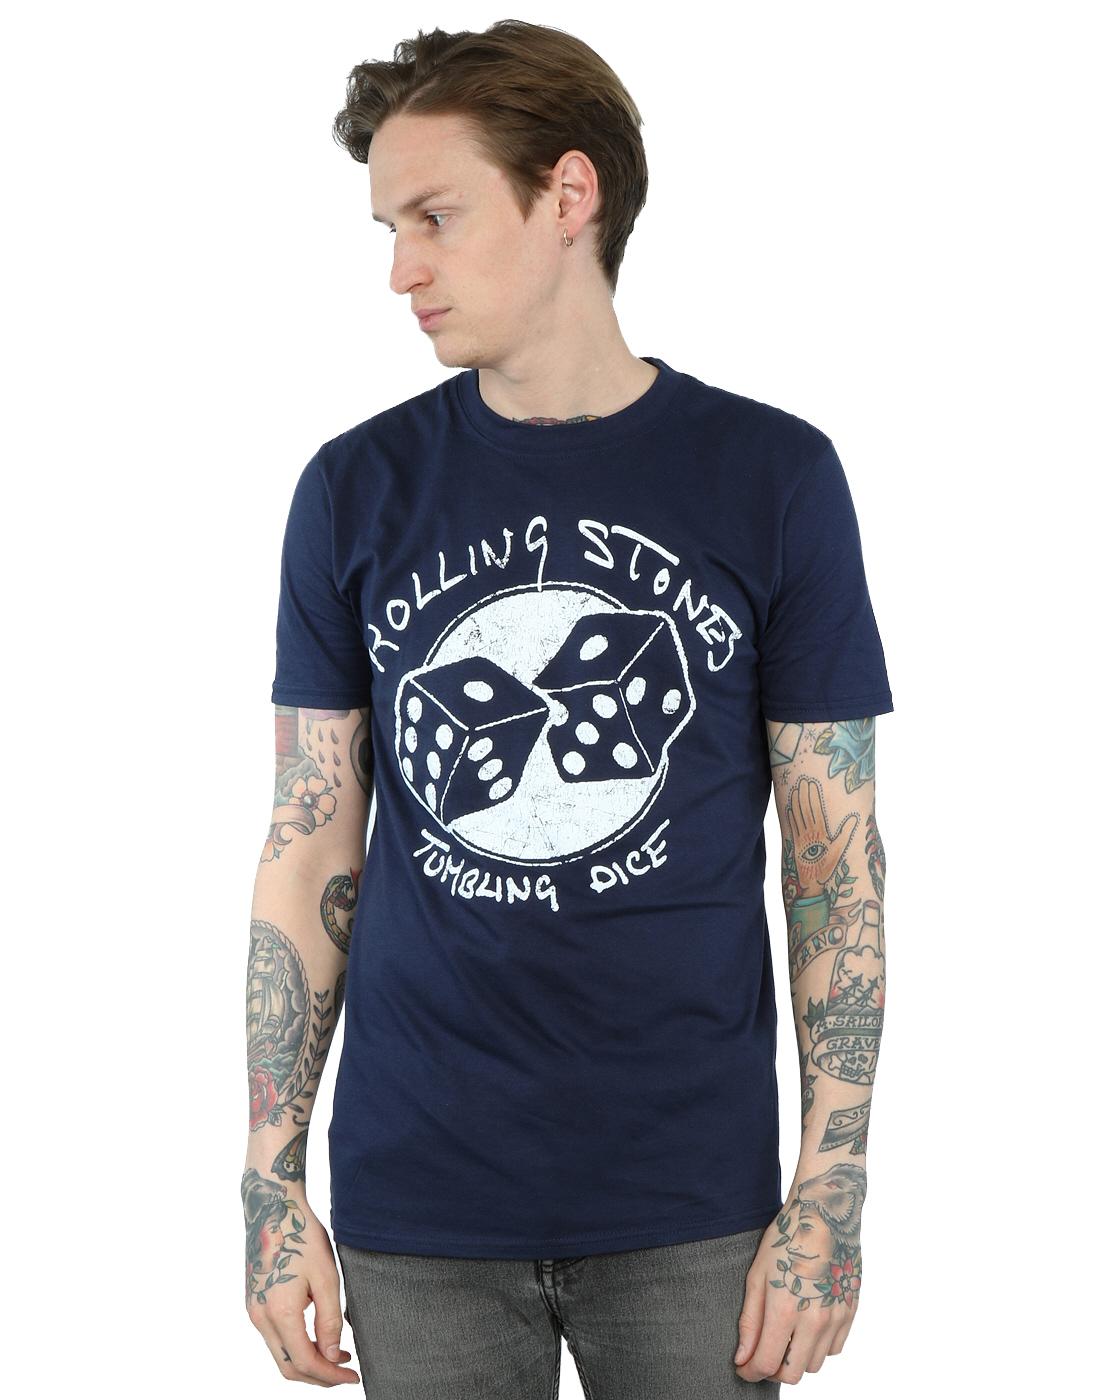 rolling stones men 39 s t shirt official band merchandise ebay. Black Bedroom Furniture Sets. Home Design Ideas